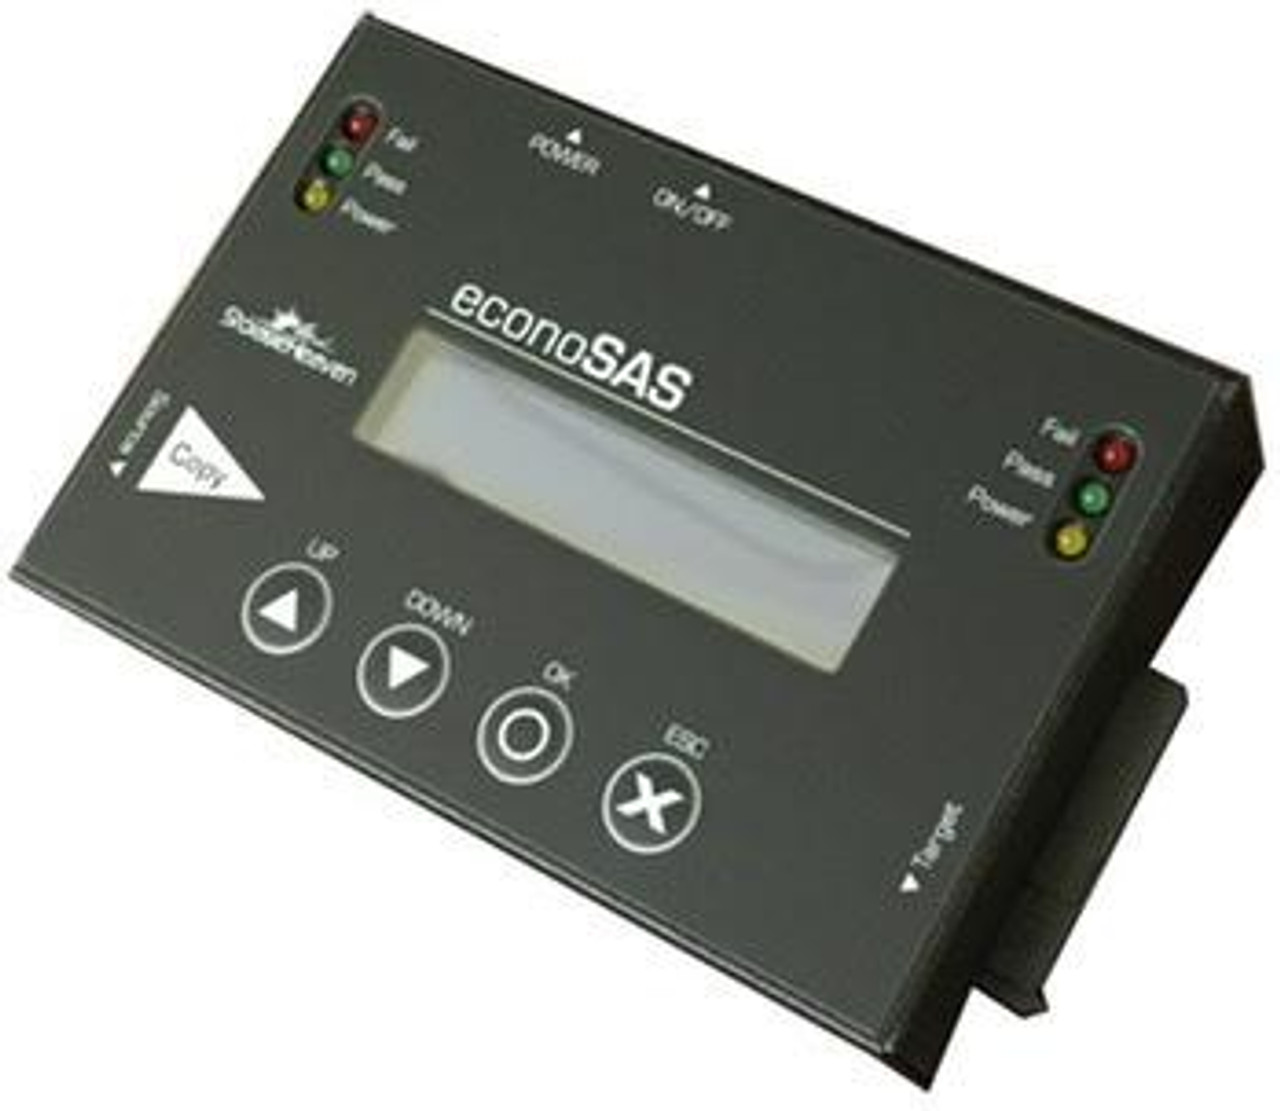 "EconoSAS Portable M.2 SSD SATA, 2.5"" & 3.5"" SAS/SATA & CFast Drive Copier & DoD Eraser"